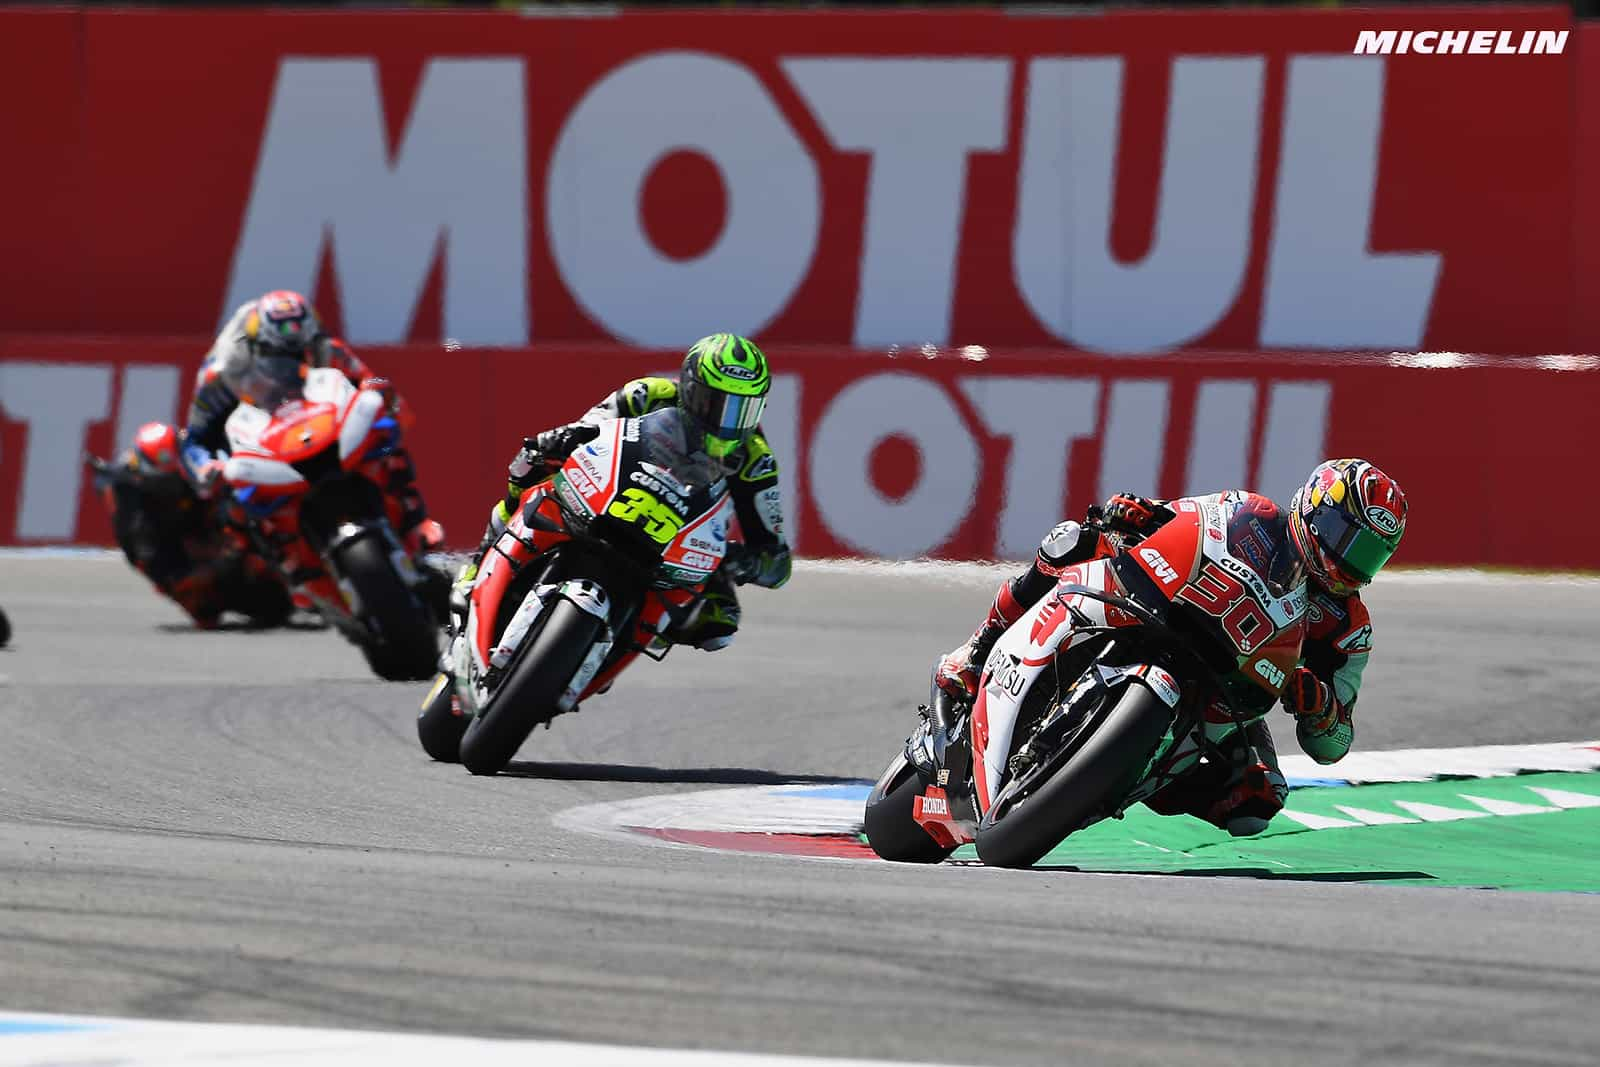 MotoGP2019オランダGP 中上 「残念な結果だが怪我はない」